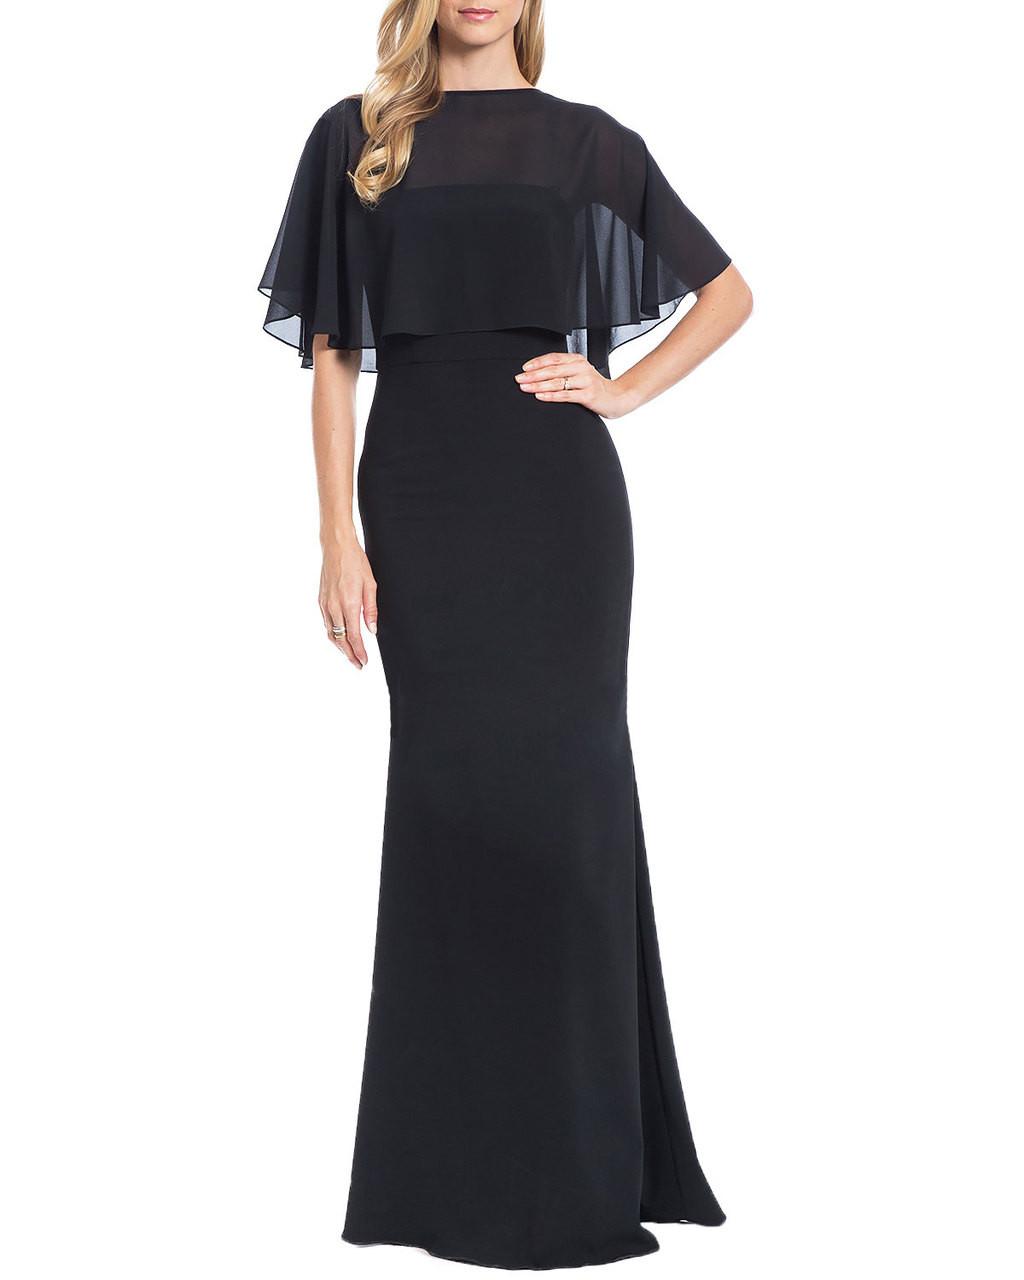 2558ccbd8e3 Chiffon Cape Evening Gown by Badgley Mischka